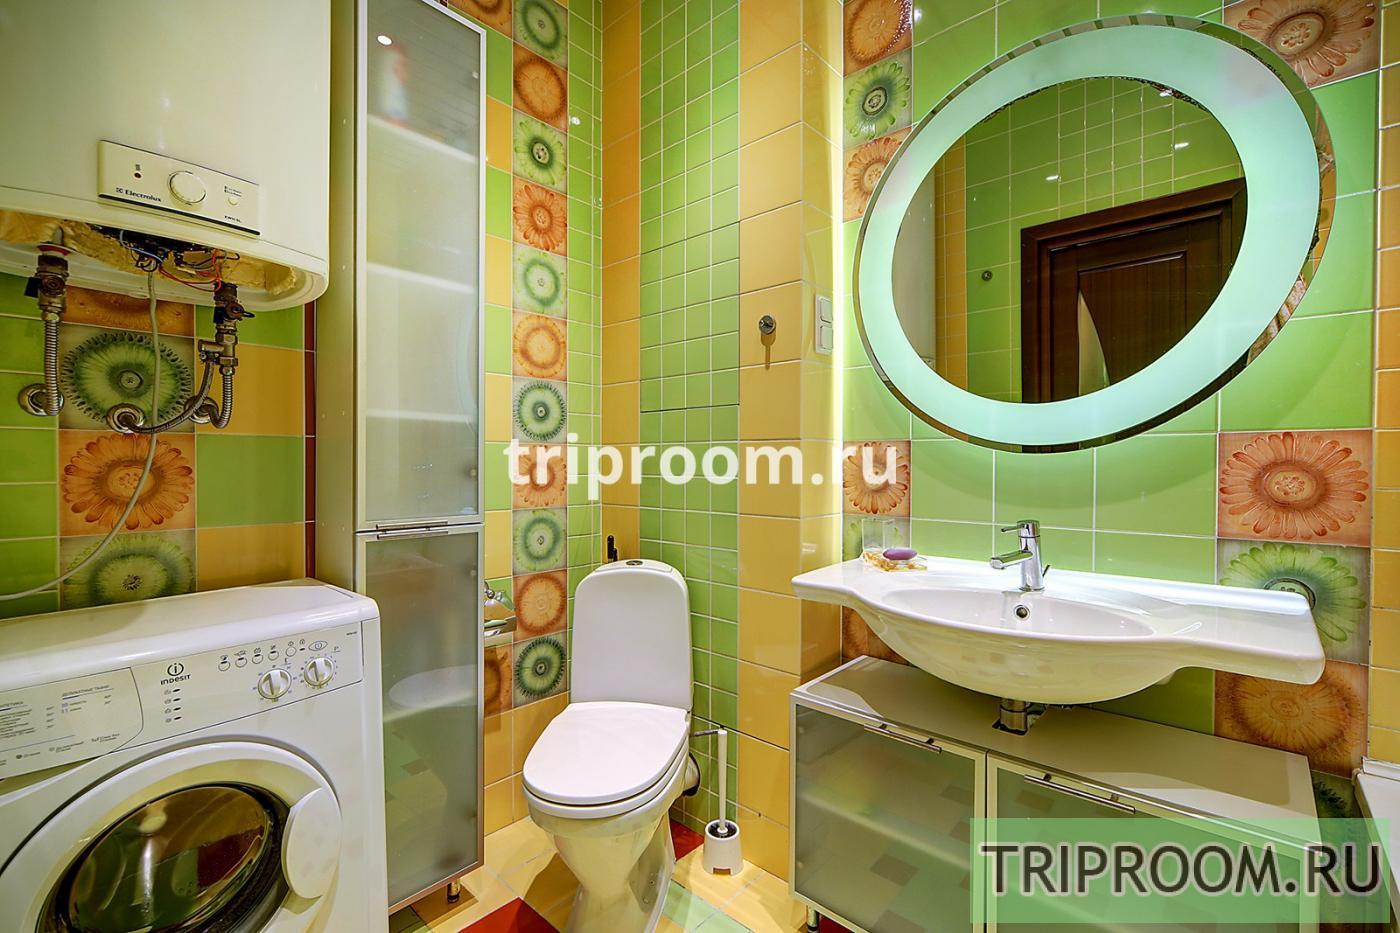 1-комнатная квартира посуточно (вариант № 15117), ул. Канала Грибоедова набережная, фото № 14